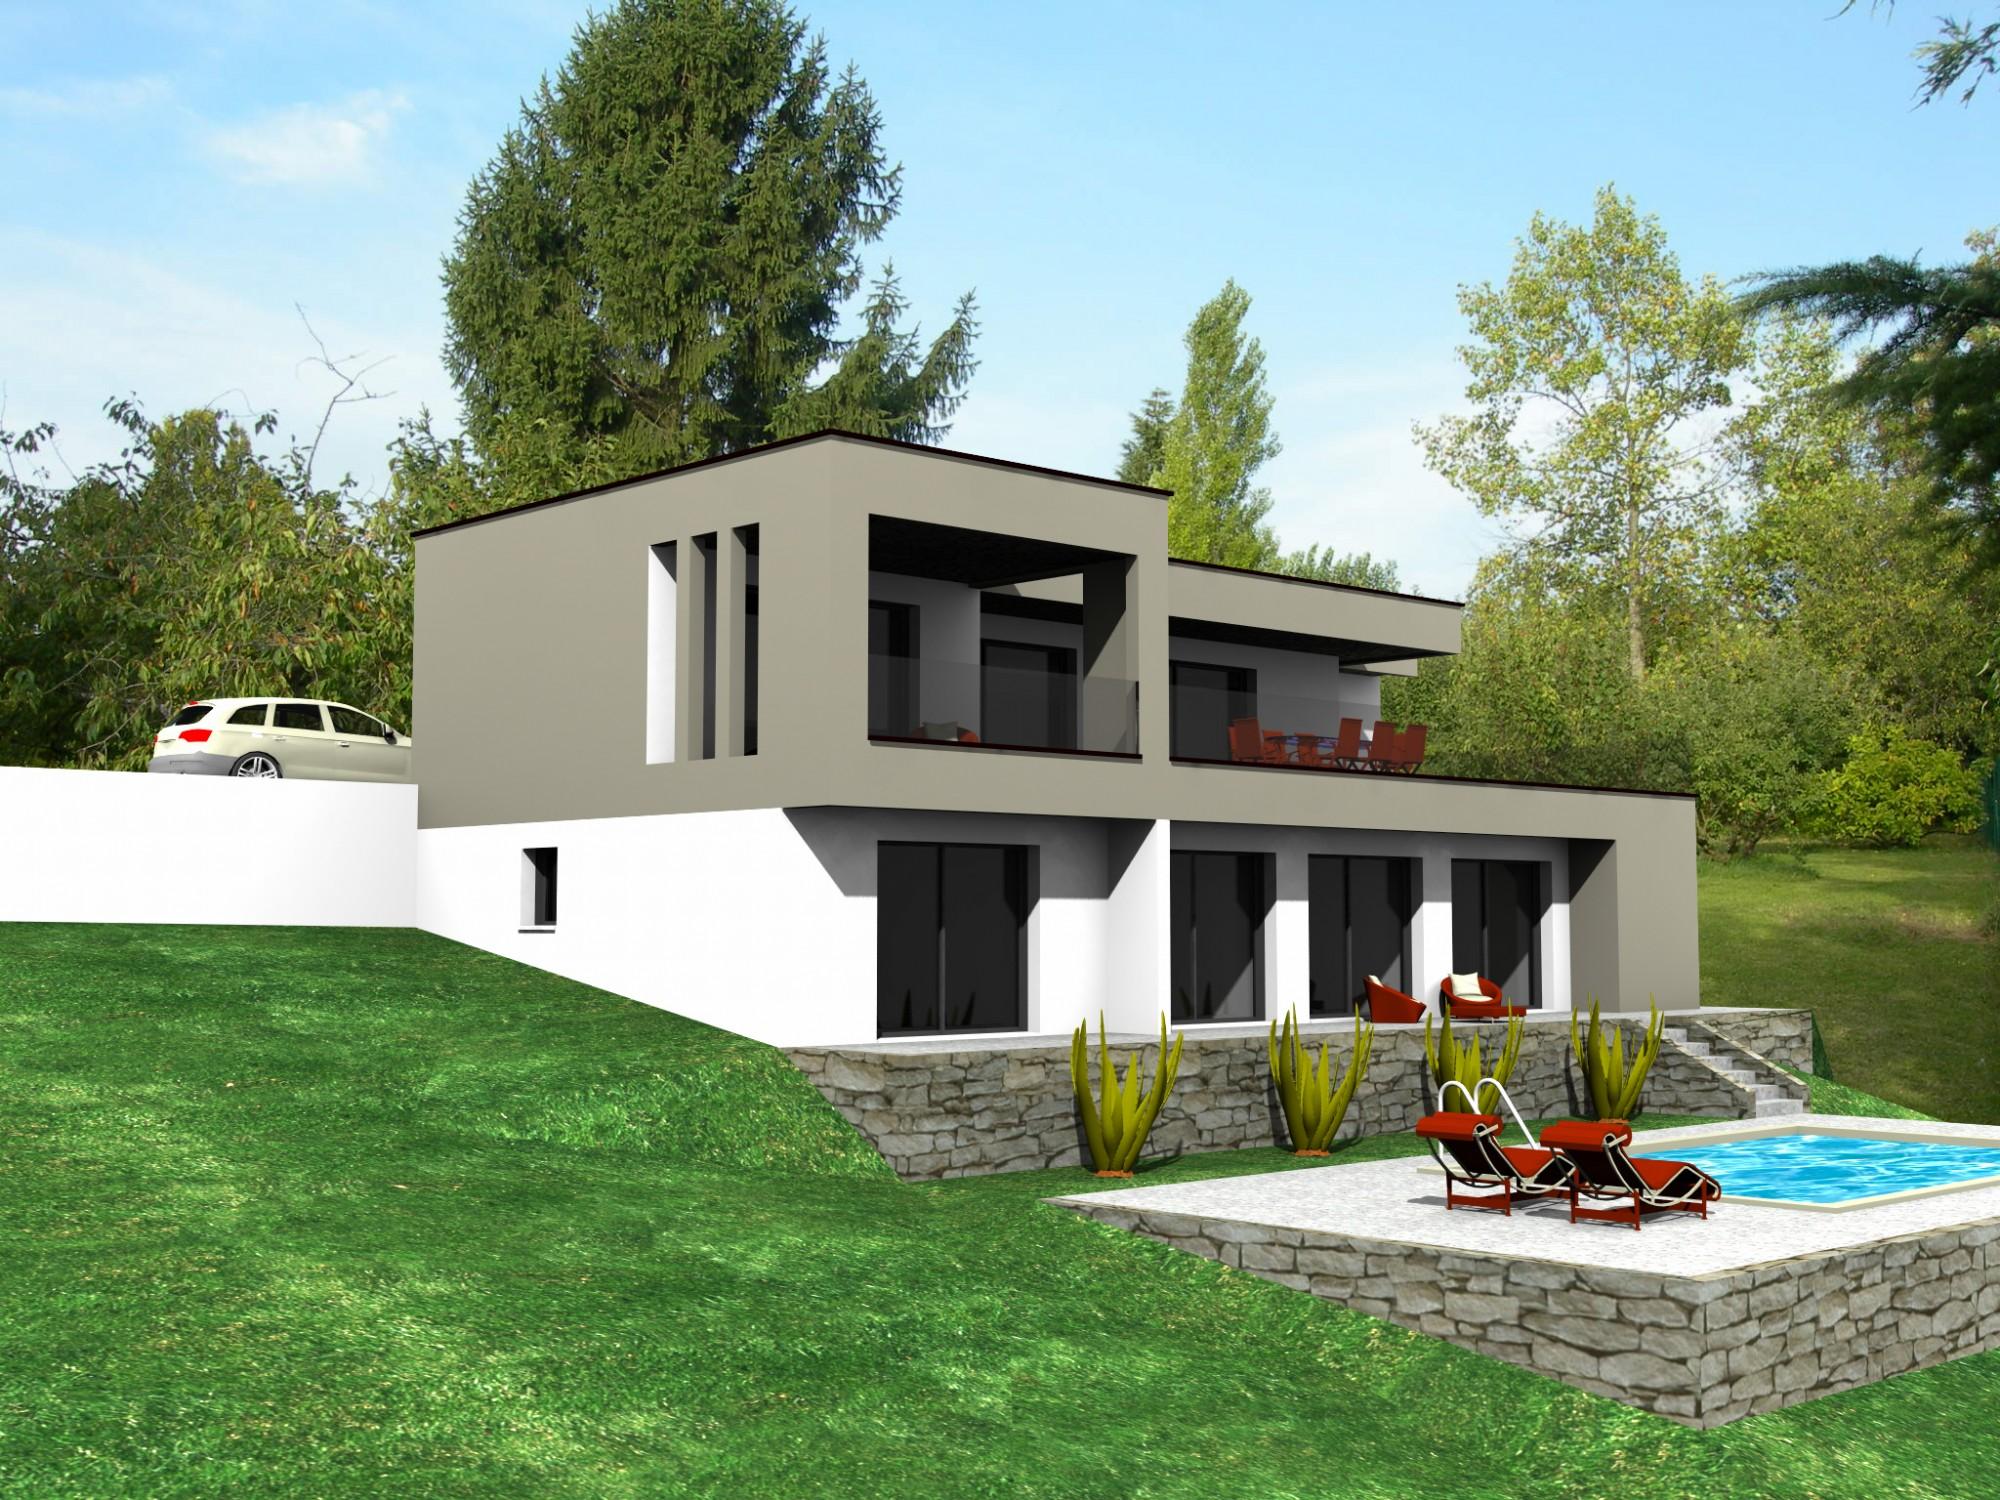 Faire Construire Une Villa Sur Mesure Rhone 69 Concept Creation